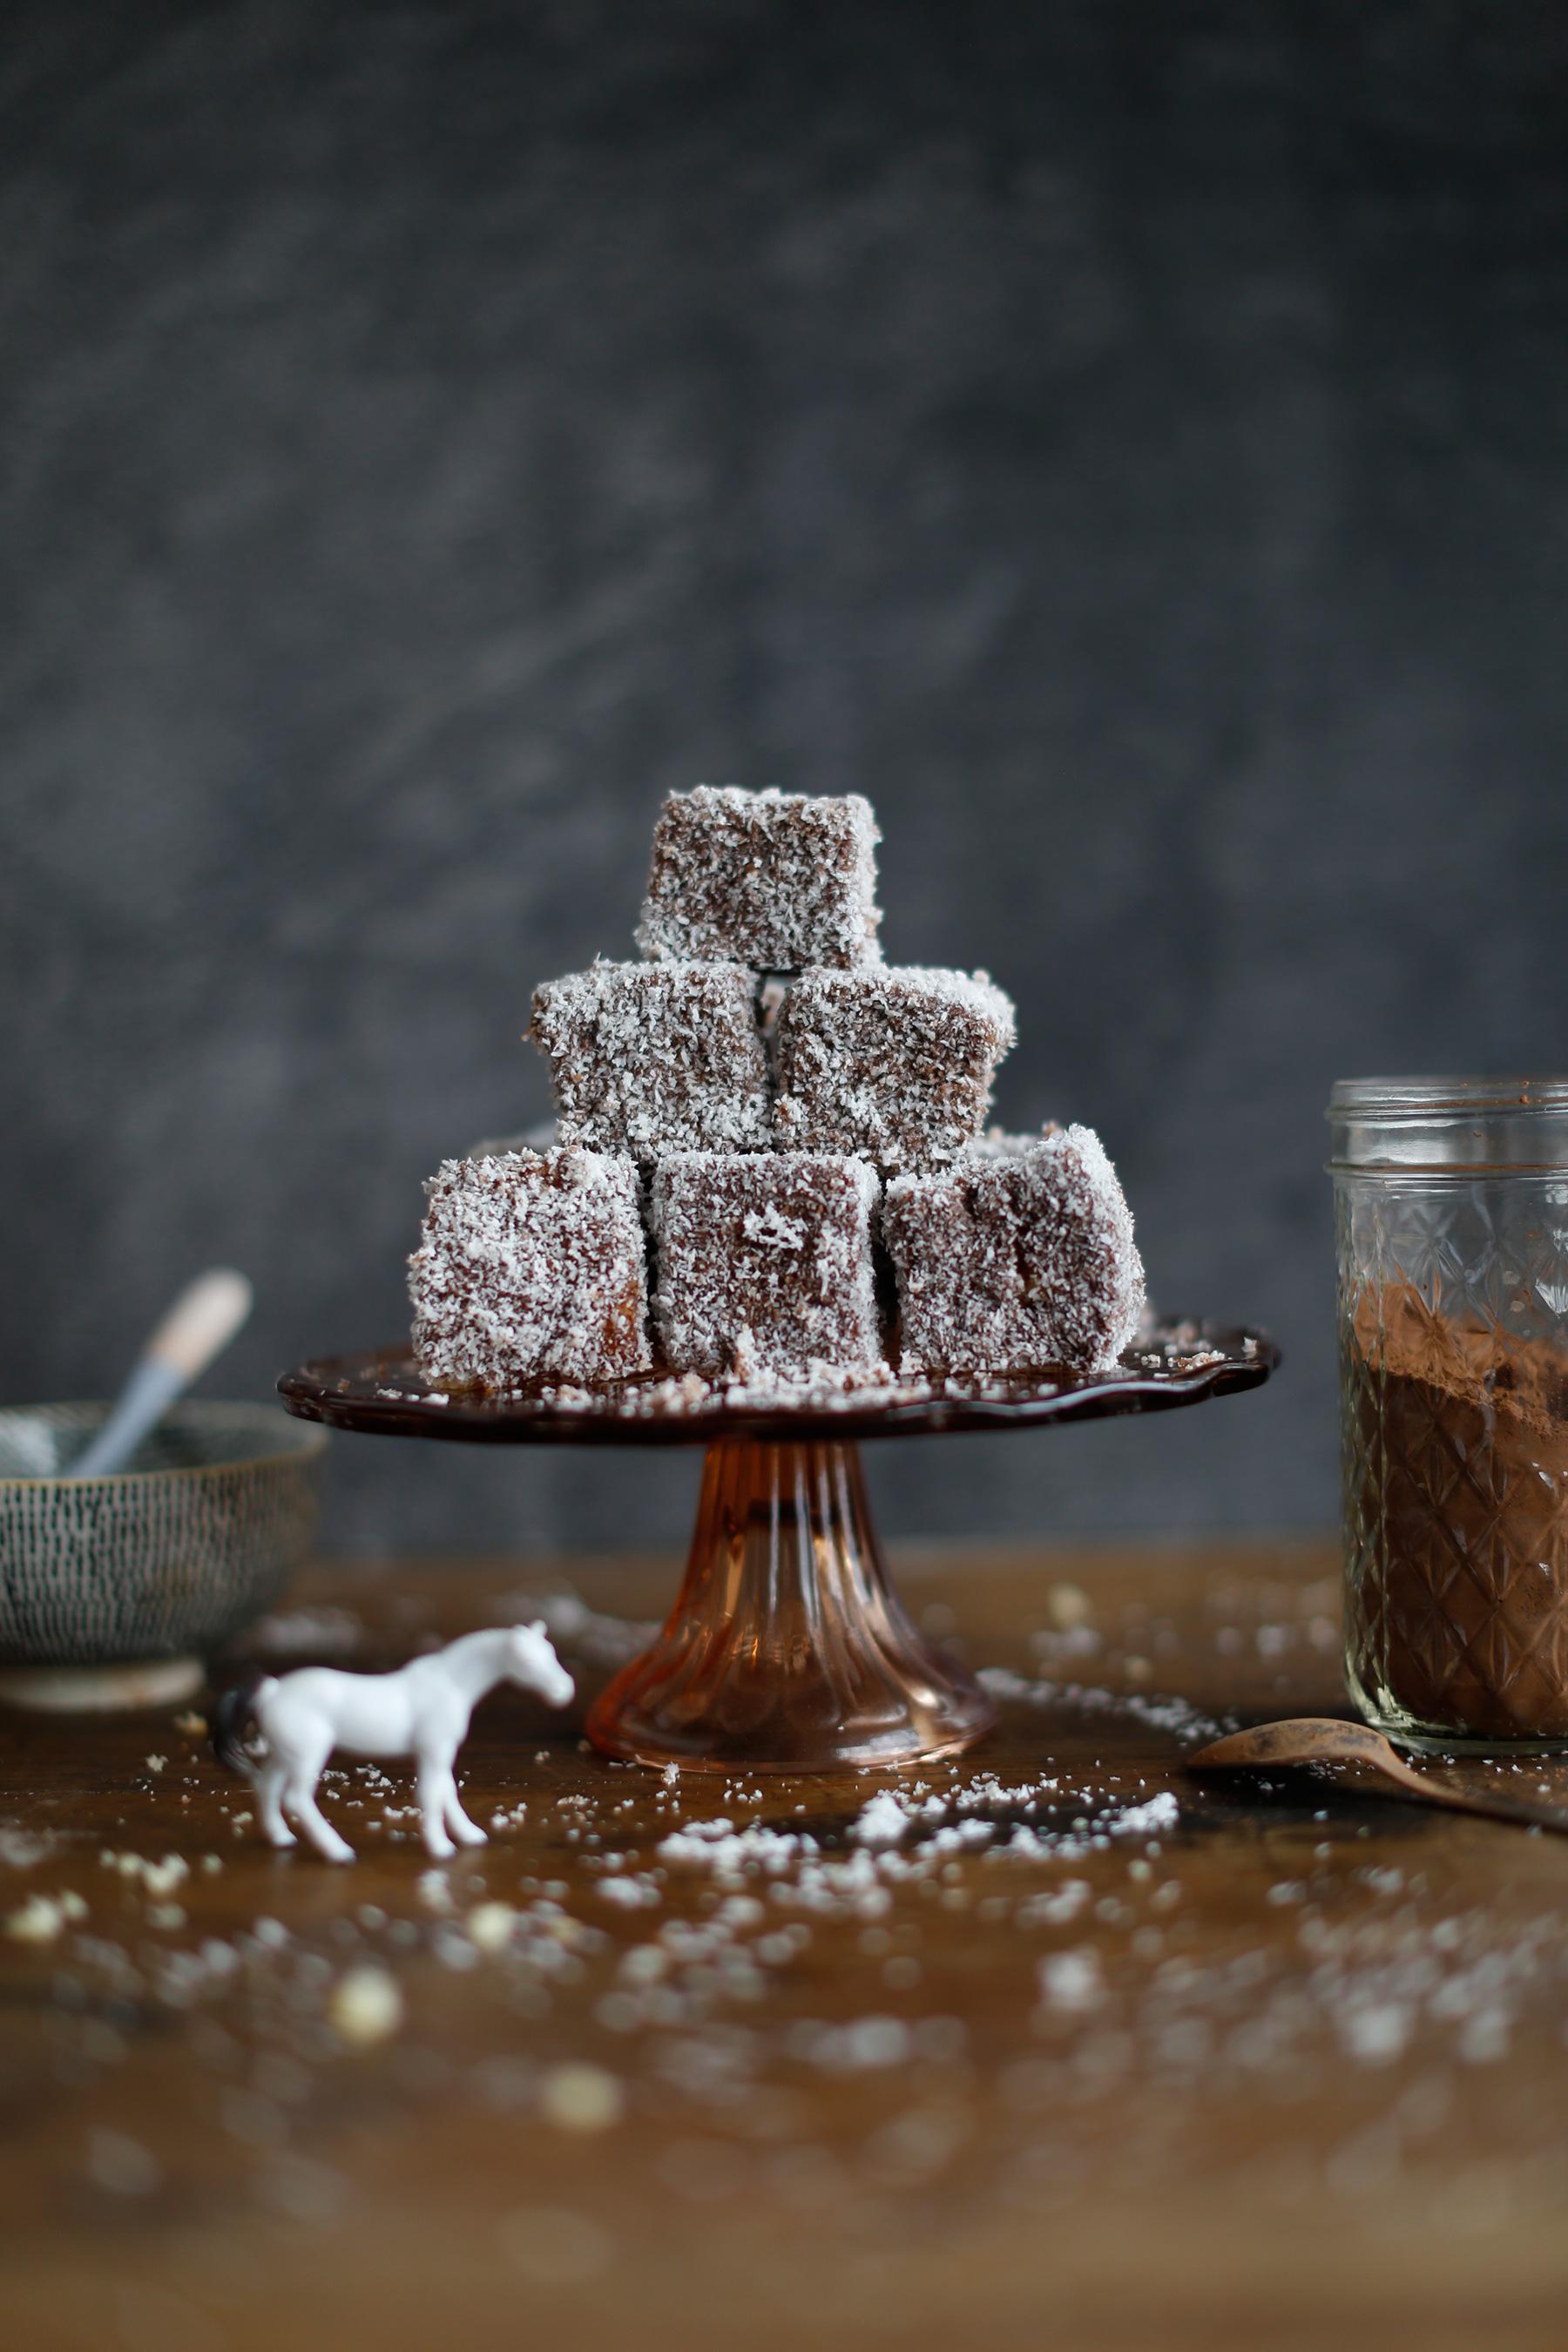 Chocolate-and-Cinnamon-Lamingtons